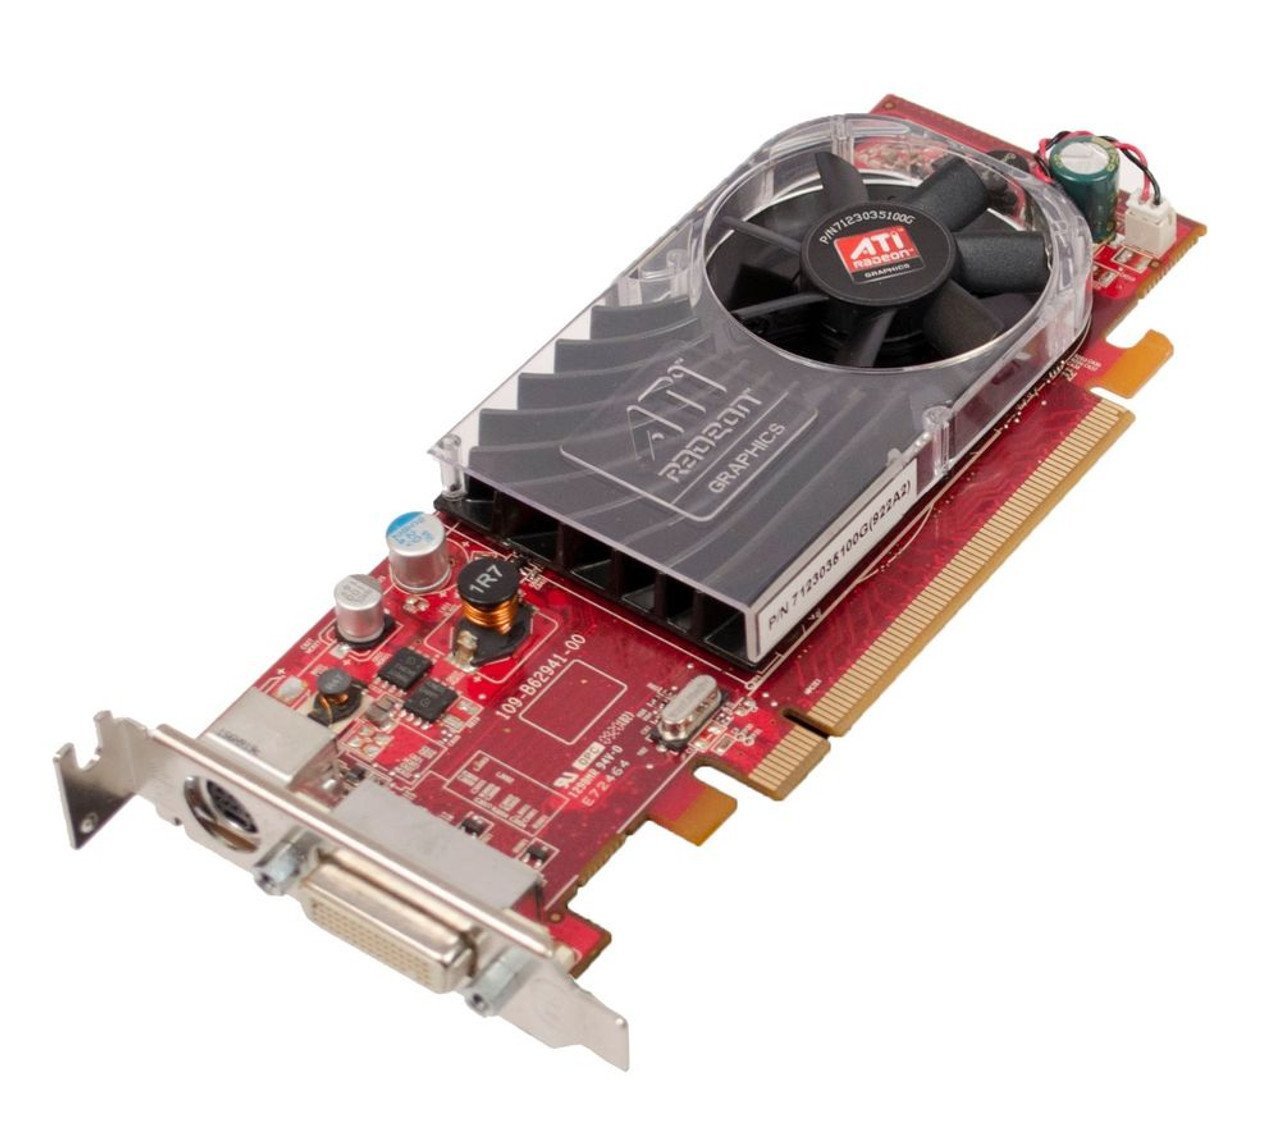 ATI Radeon HD 3450 256MB DDR2 Video Card 109-B62941-00 Y104D DUAL DVI CABLE